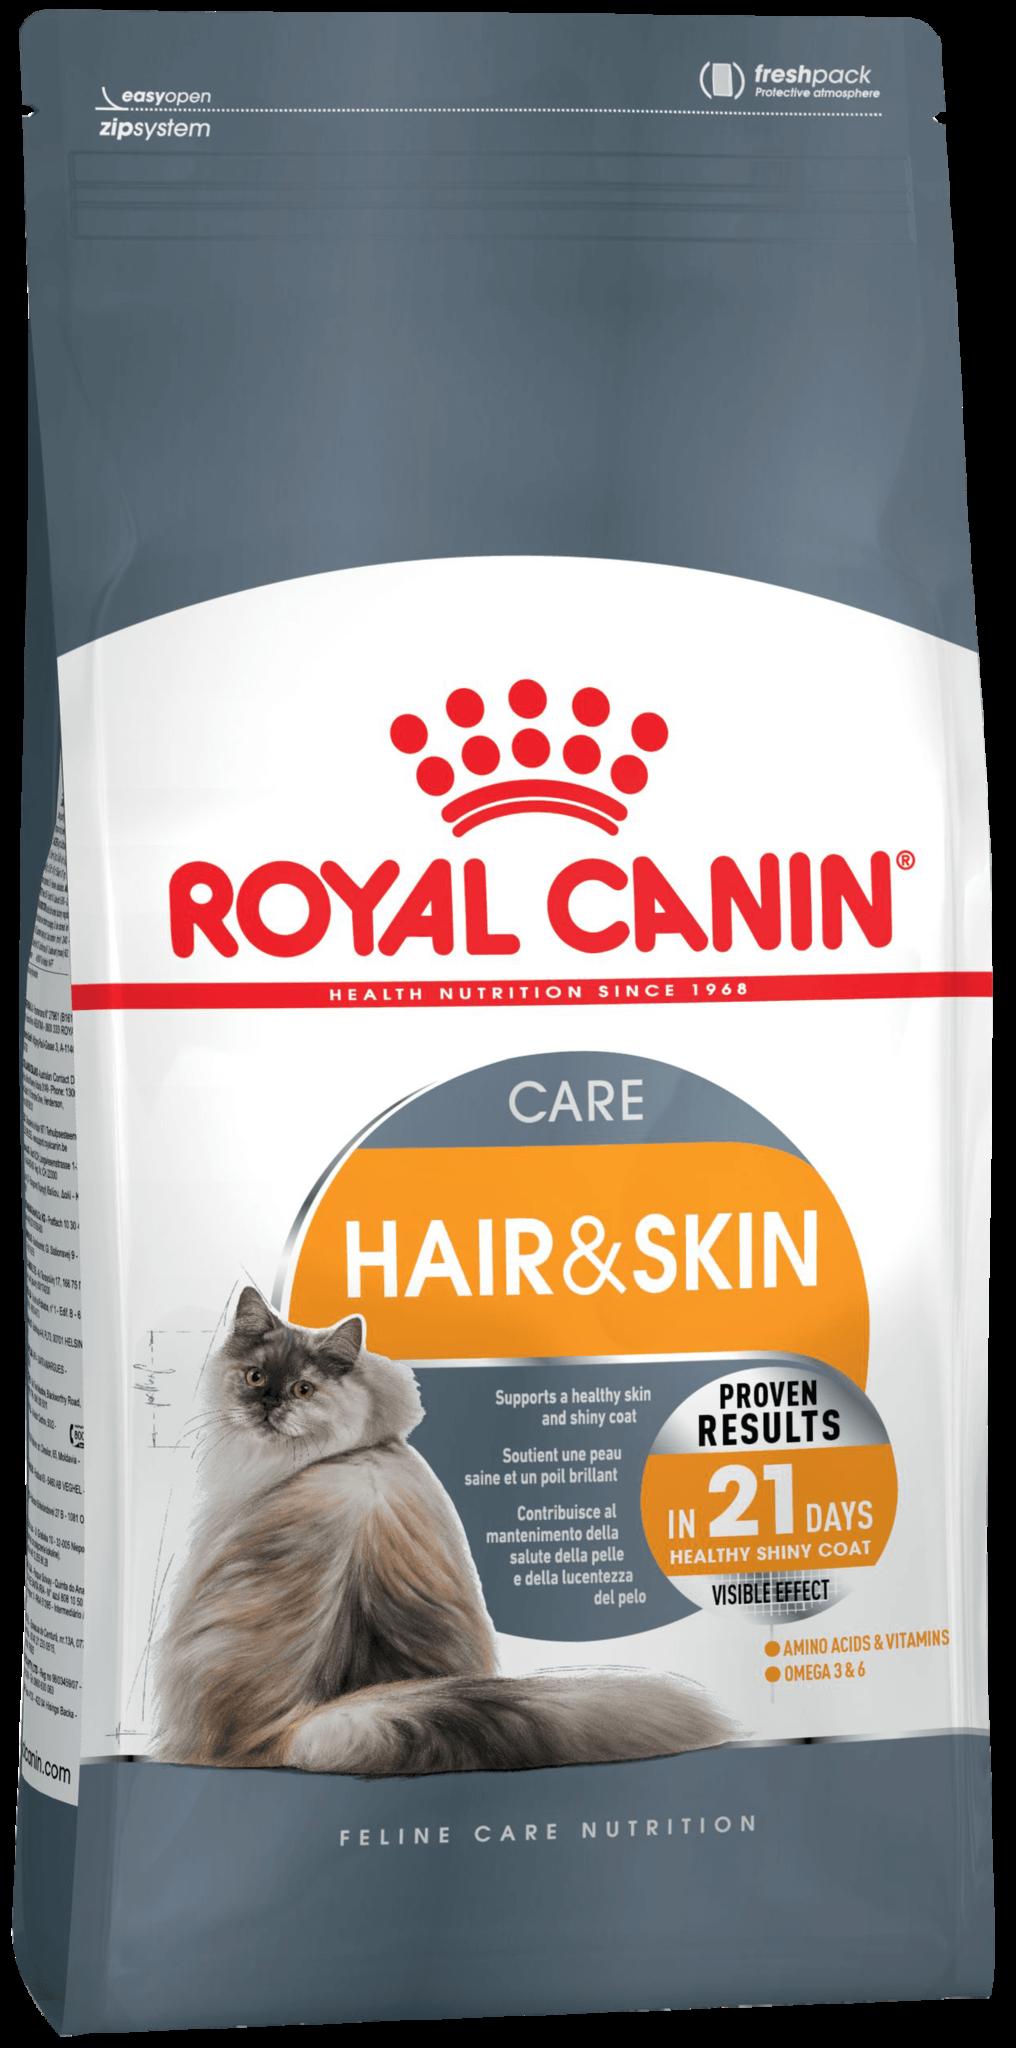 Royal Canin Корм для кошек, Royal Canin Hair & Skin Care, здоровье шерсти и кожи, в возрасте от 1 года и старше f_hair-skin.png